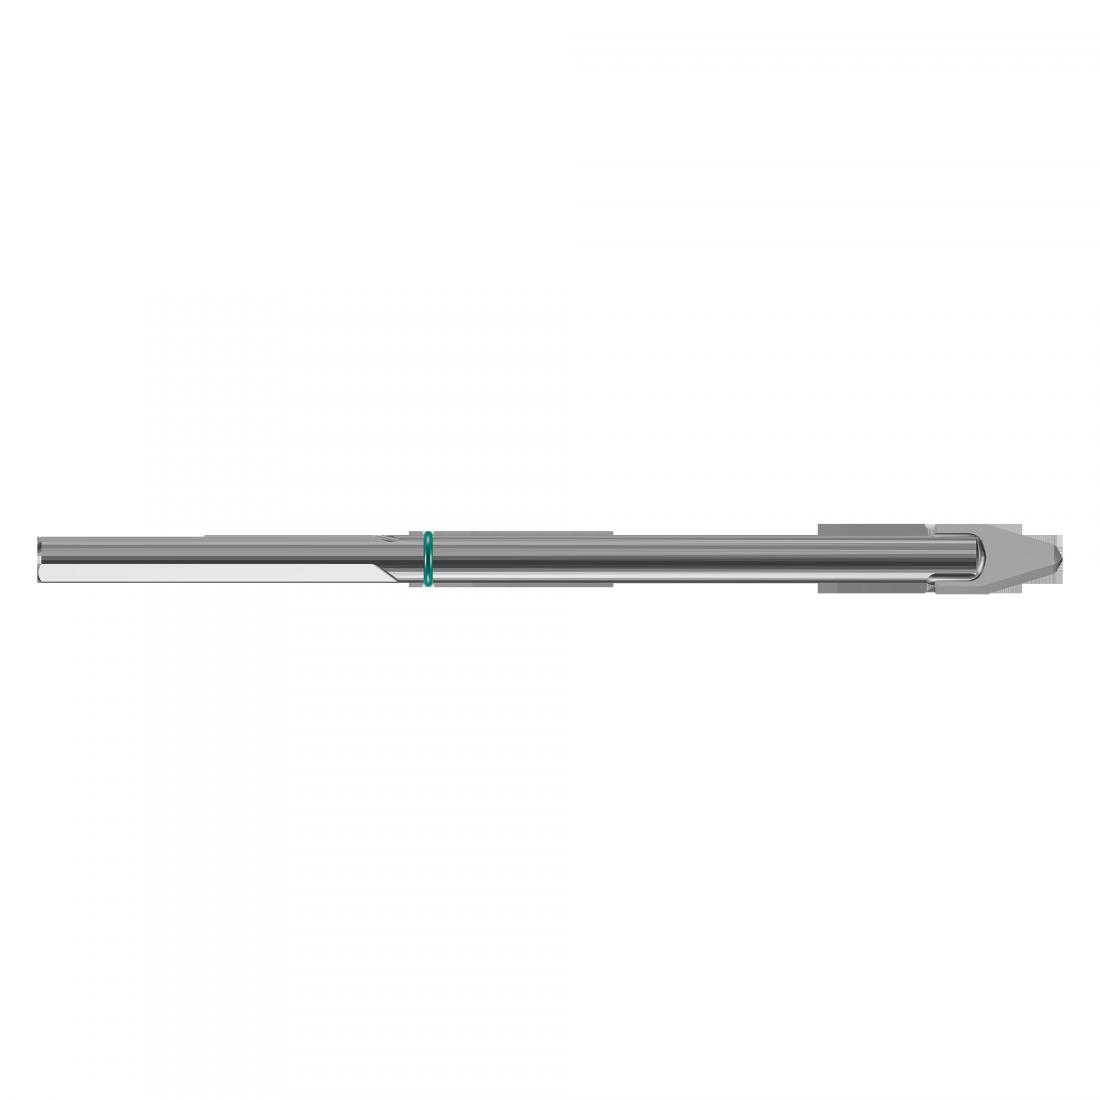 Сверло по керамограниту Heller CeraExpert 6х110мм